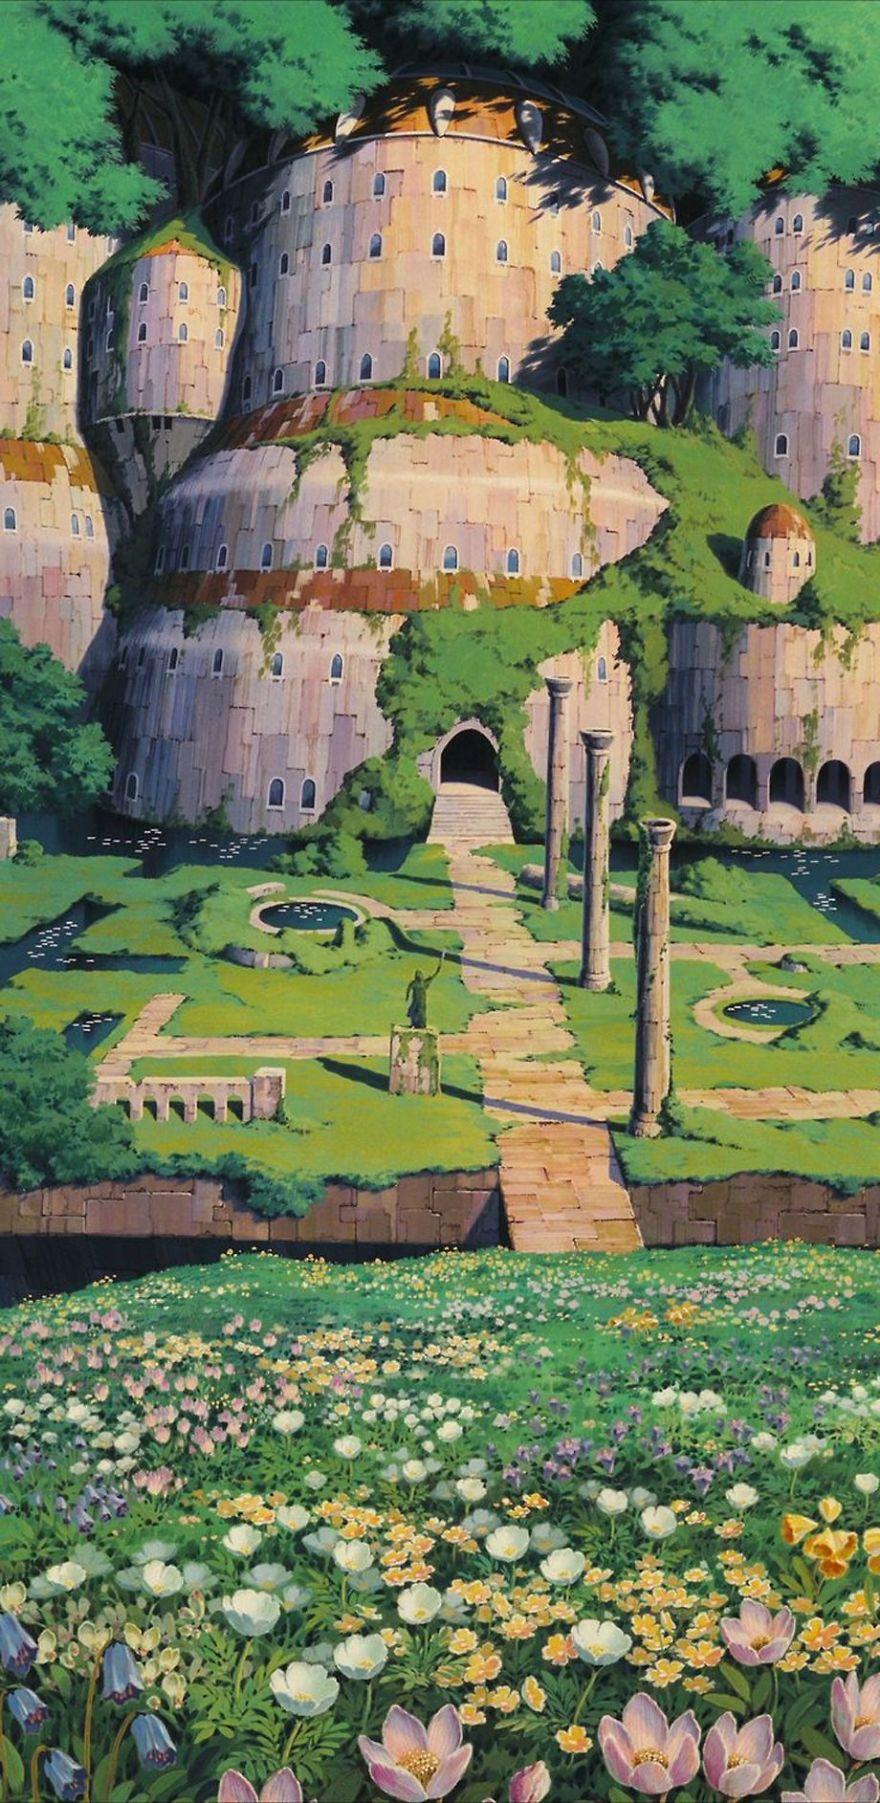 What inspired Studio Ghibli's first ever film? | Dazed